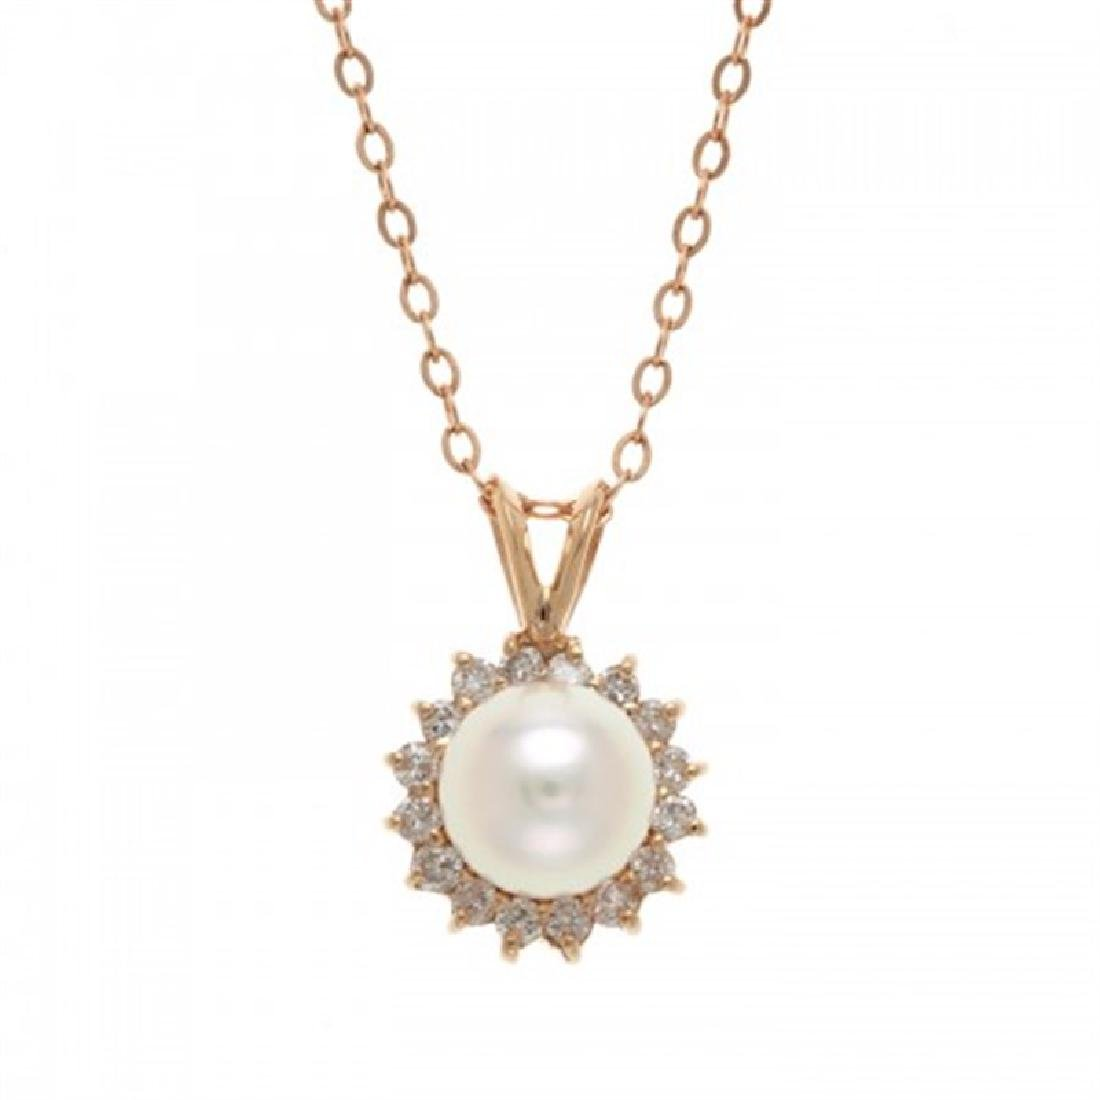 7.5-8.0mm Japanese Akoya Pendant with Diamonds